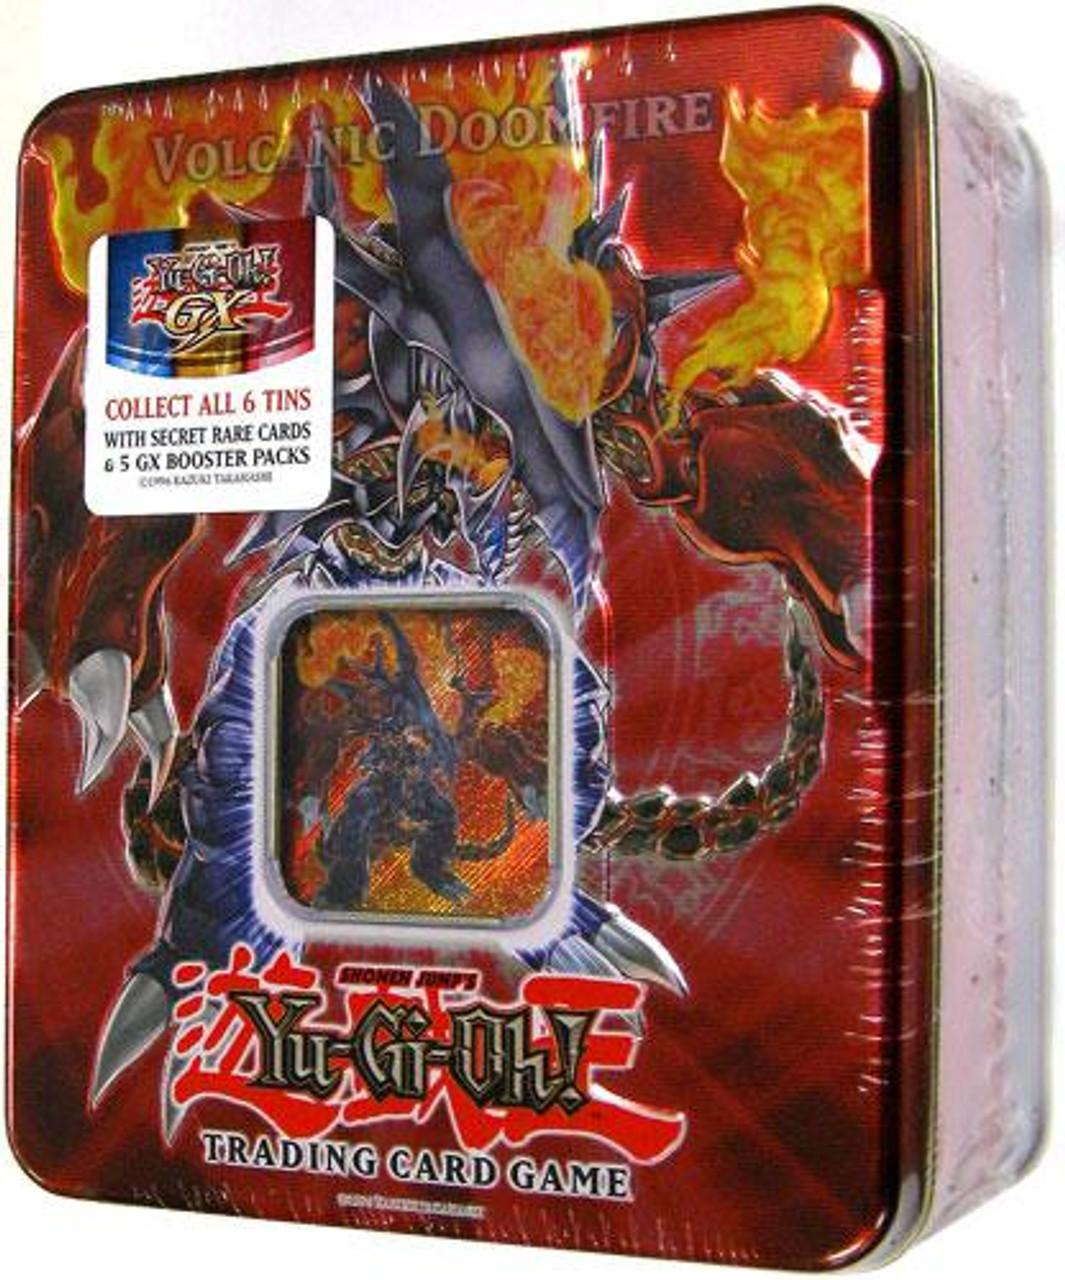 YuGiOh GX 2007 Collector Tin Volcanic Doomfire Collector Tin [Sealed]